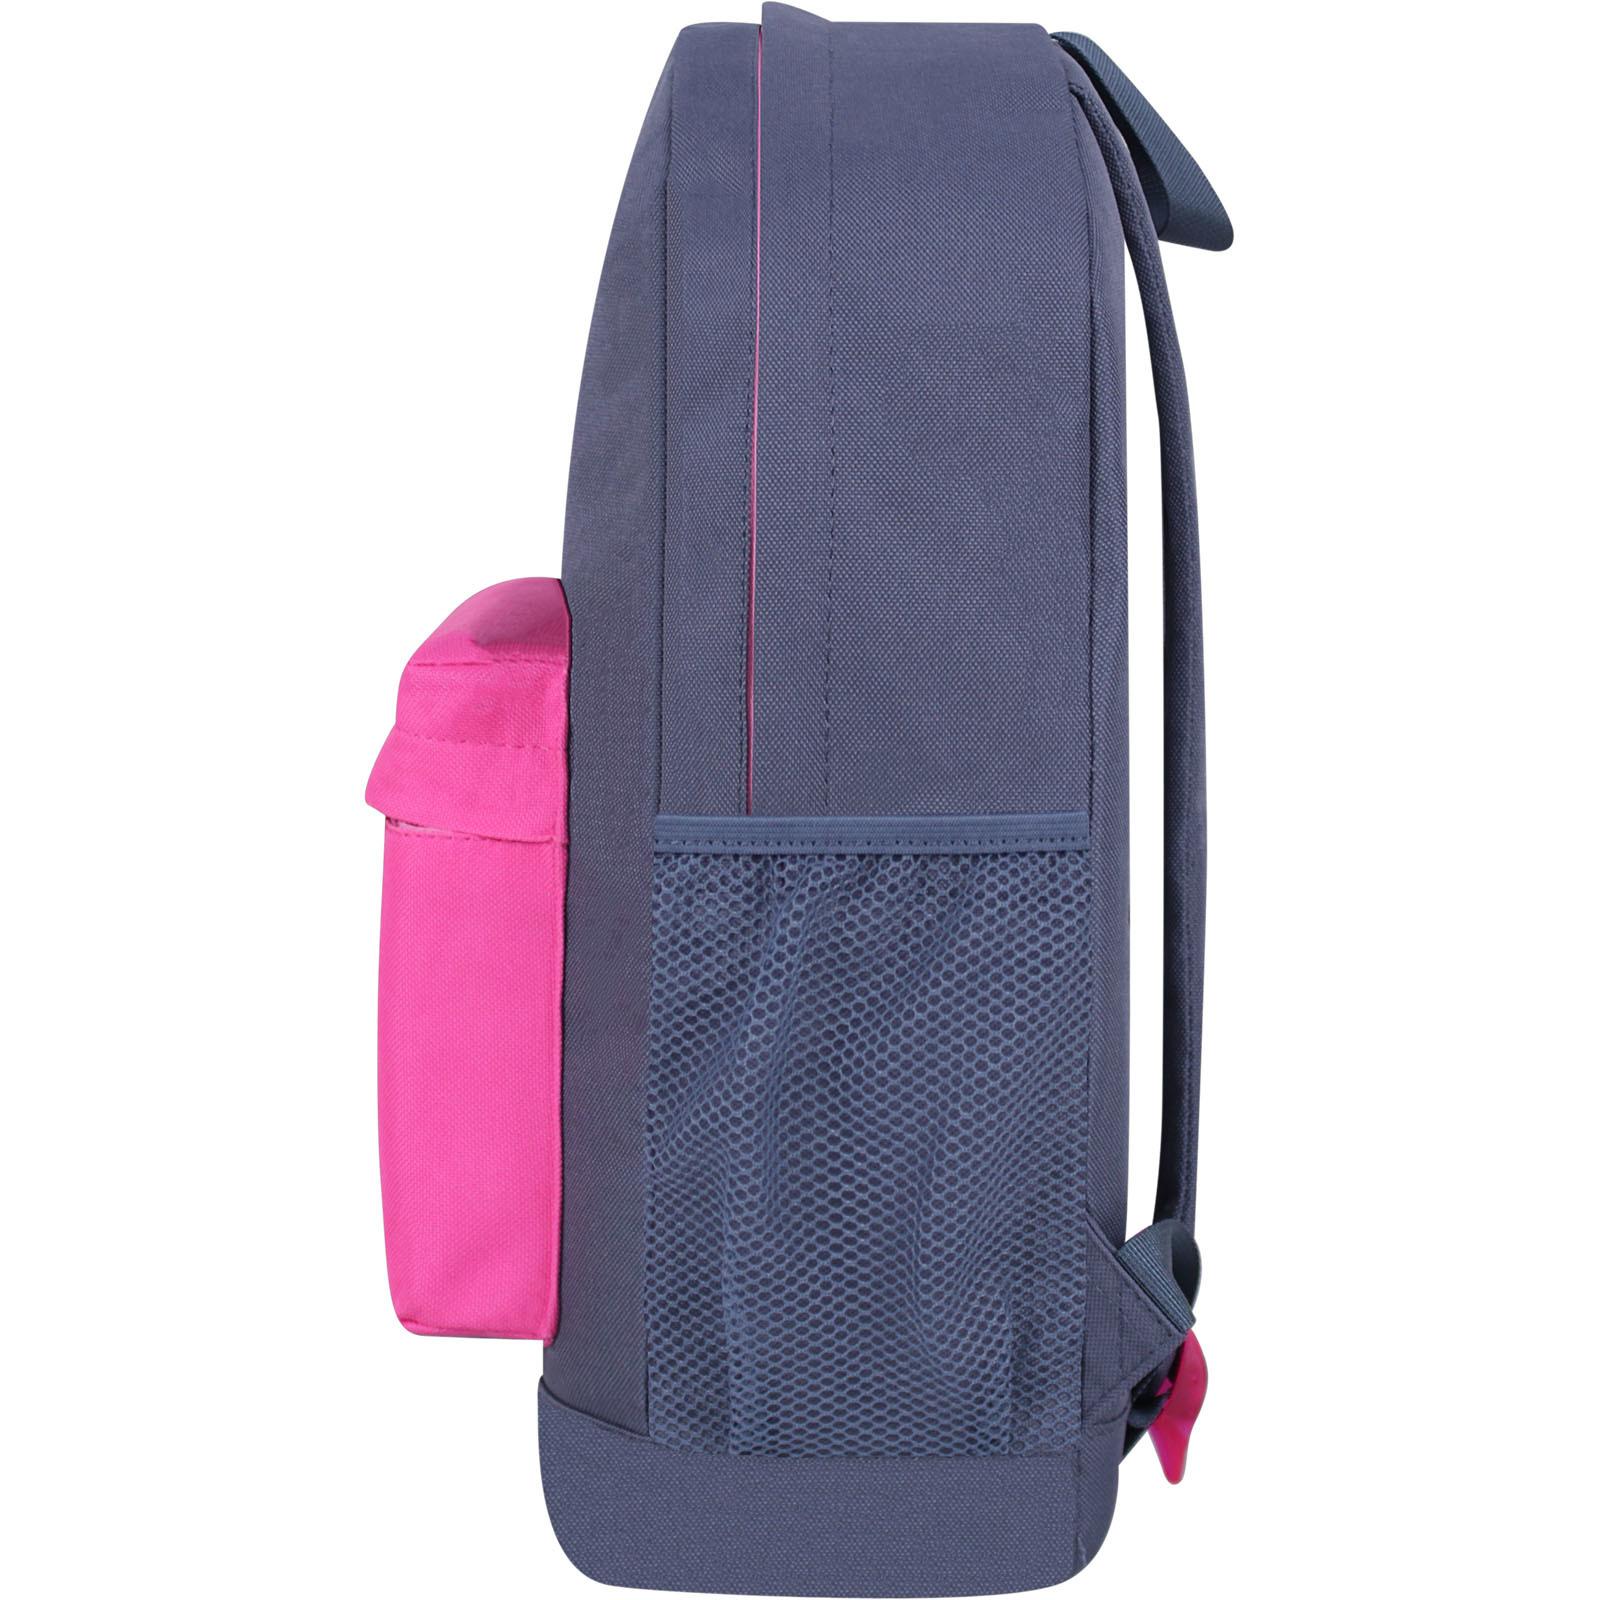 Рюкзак Bagland Молодежный W/R 17 л. Серый/розовый (00533662) фото 3